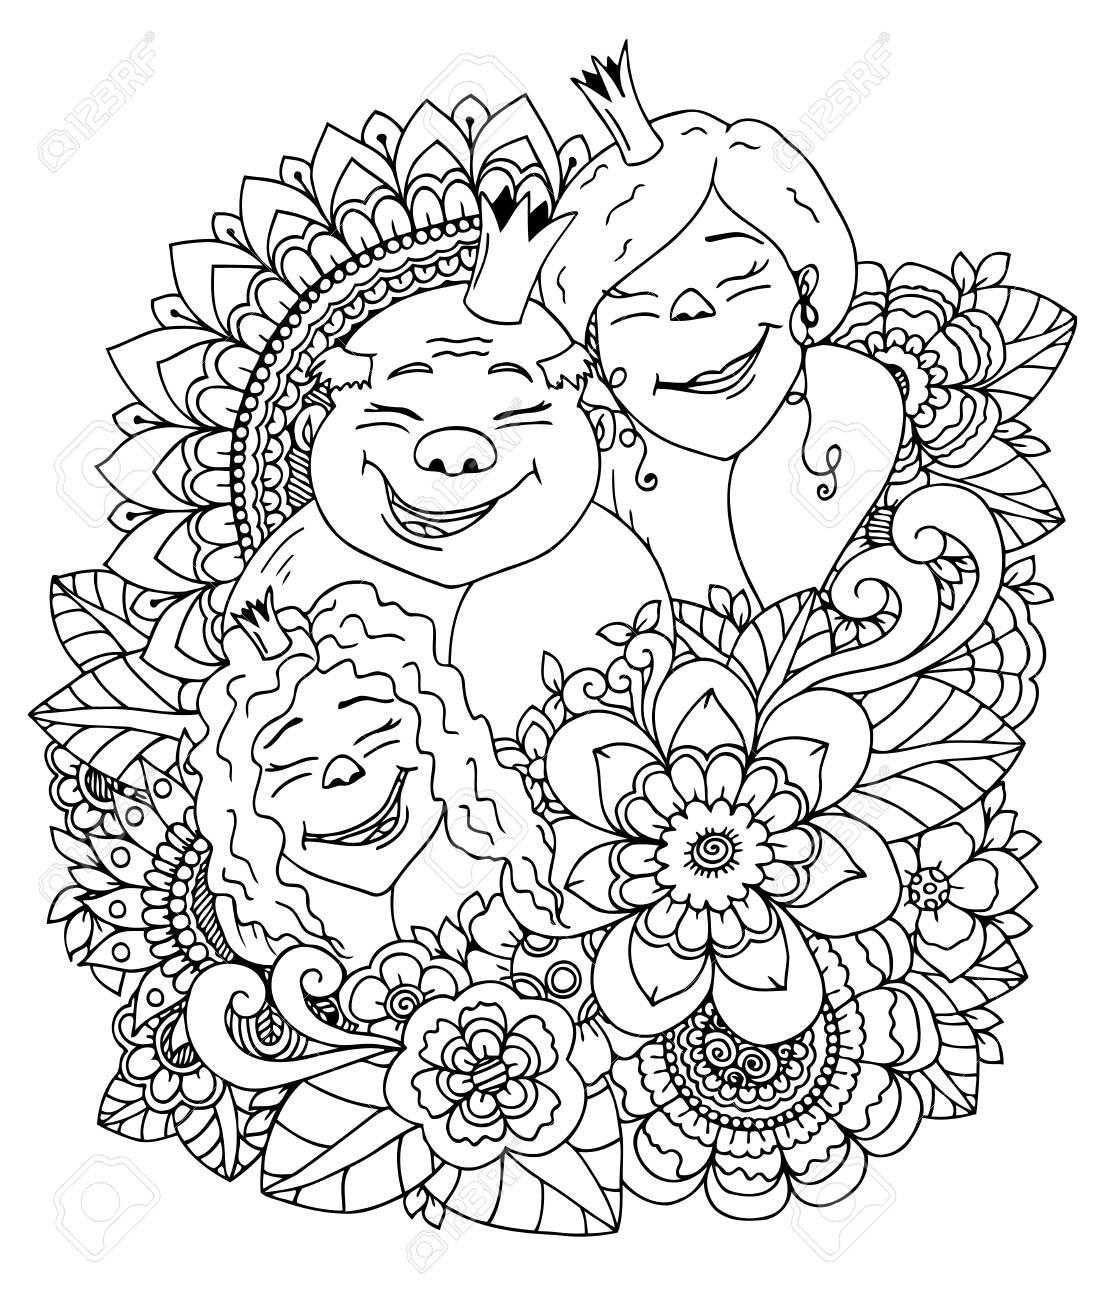 1105x1300 Vector Illustration Zentangl , The Royal Family In A Flower Frame